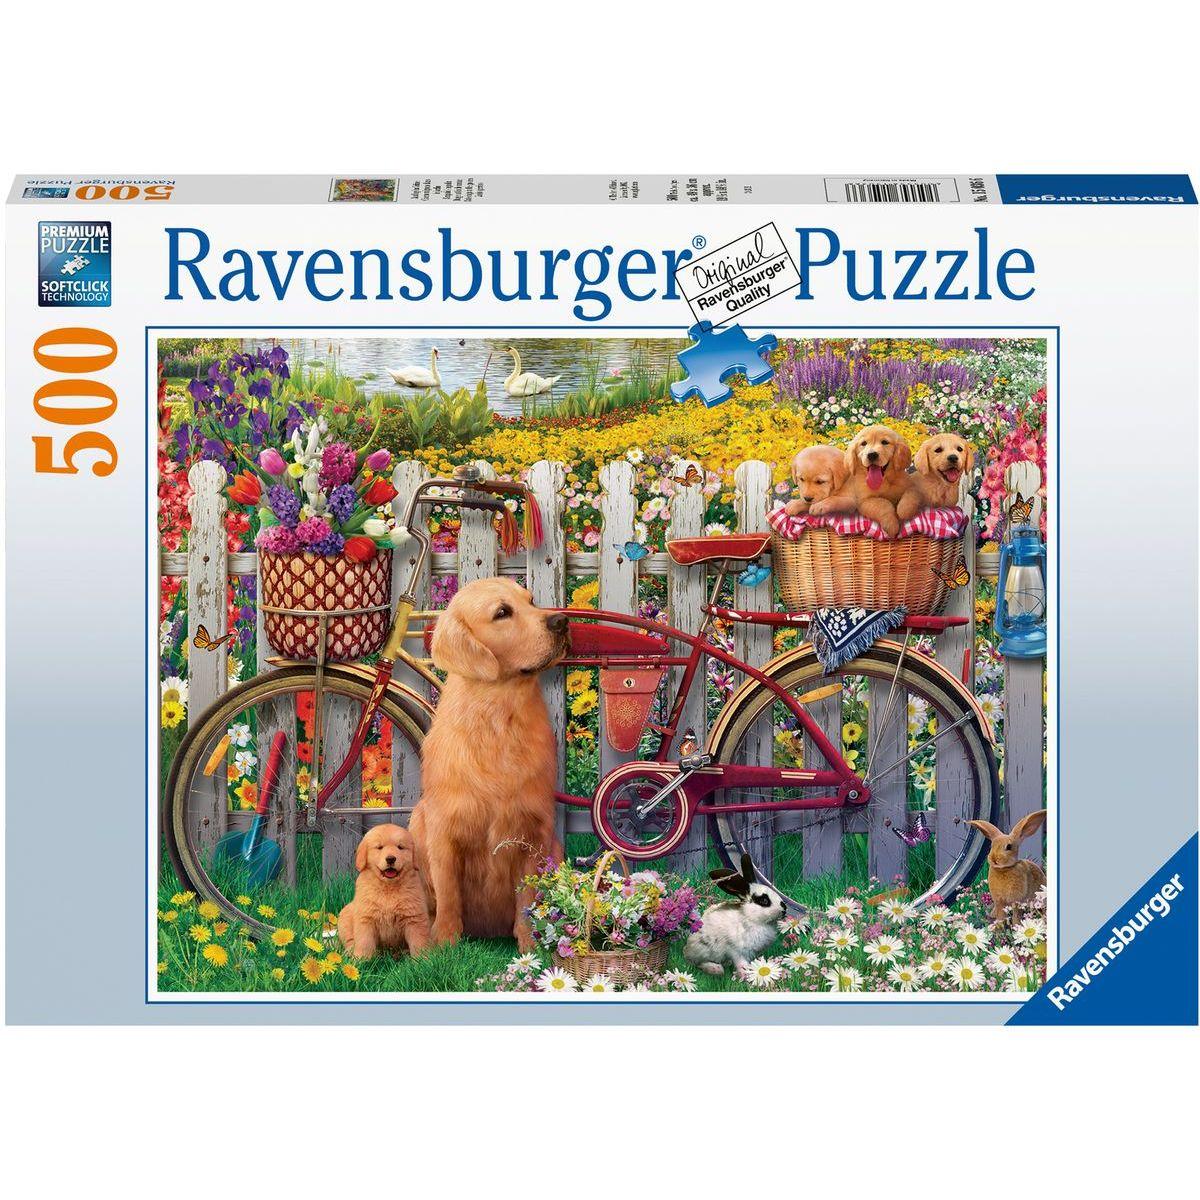 Ravensburger puzzle 150366 Roztomilí psy 500 dielikov